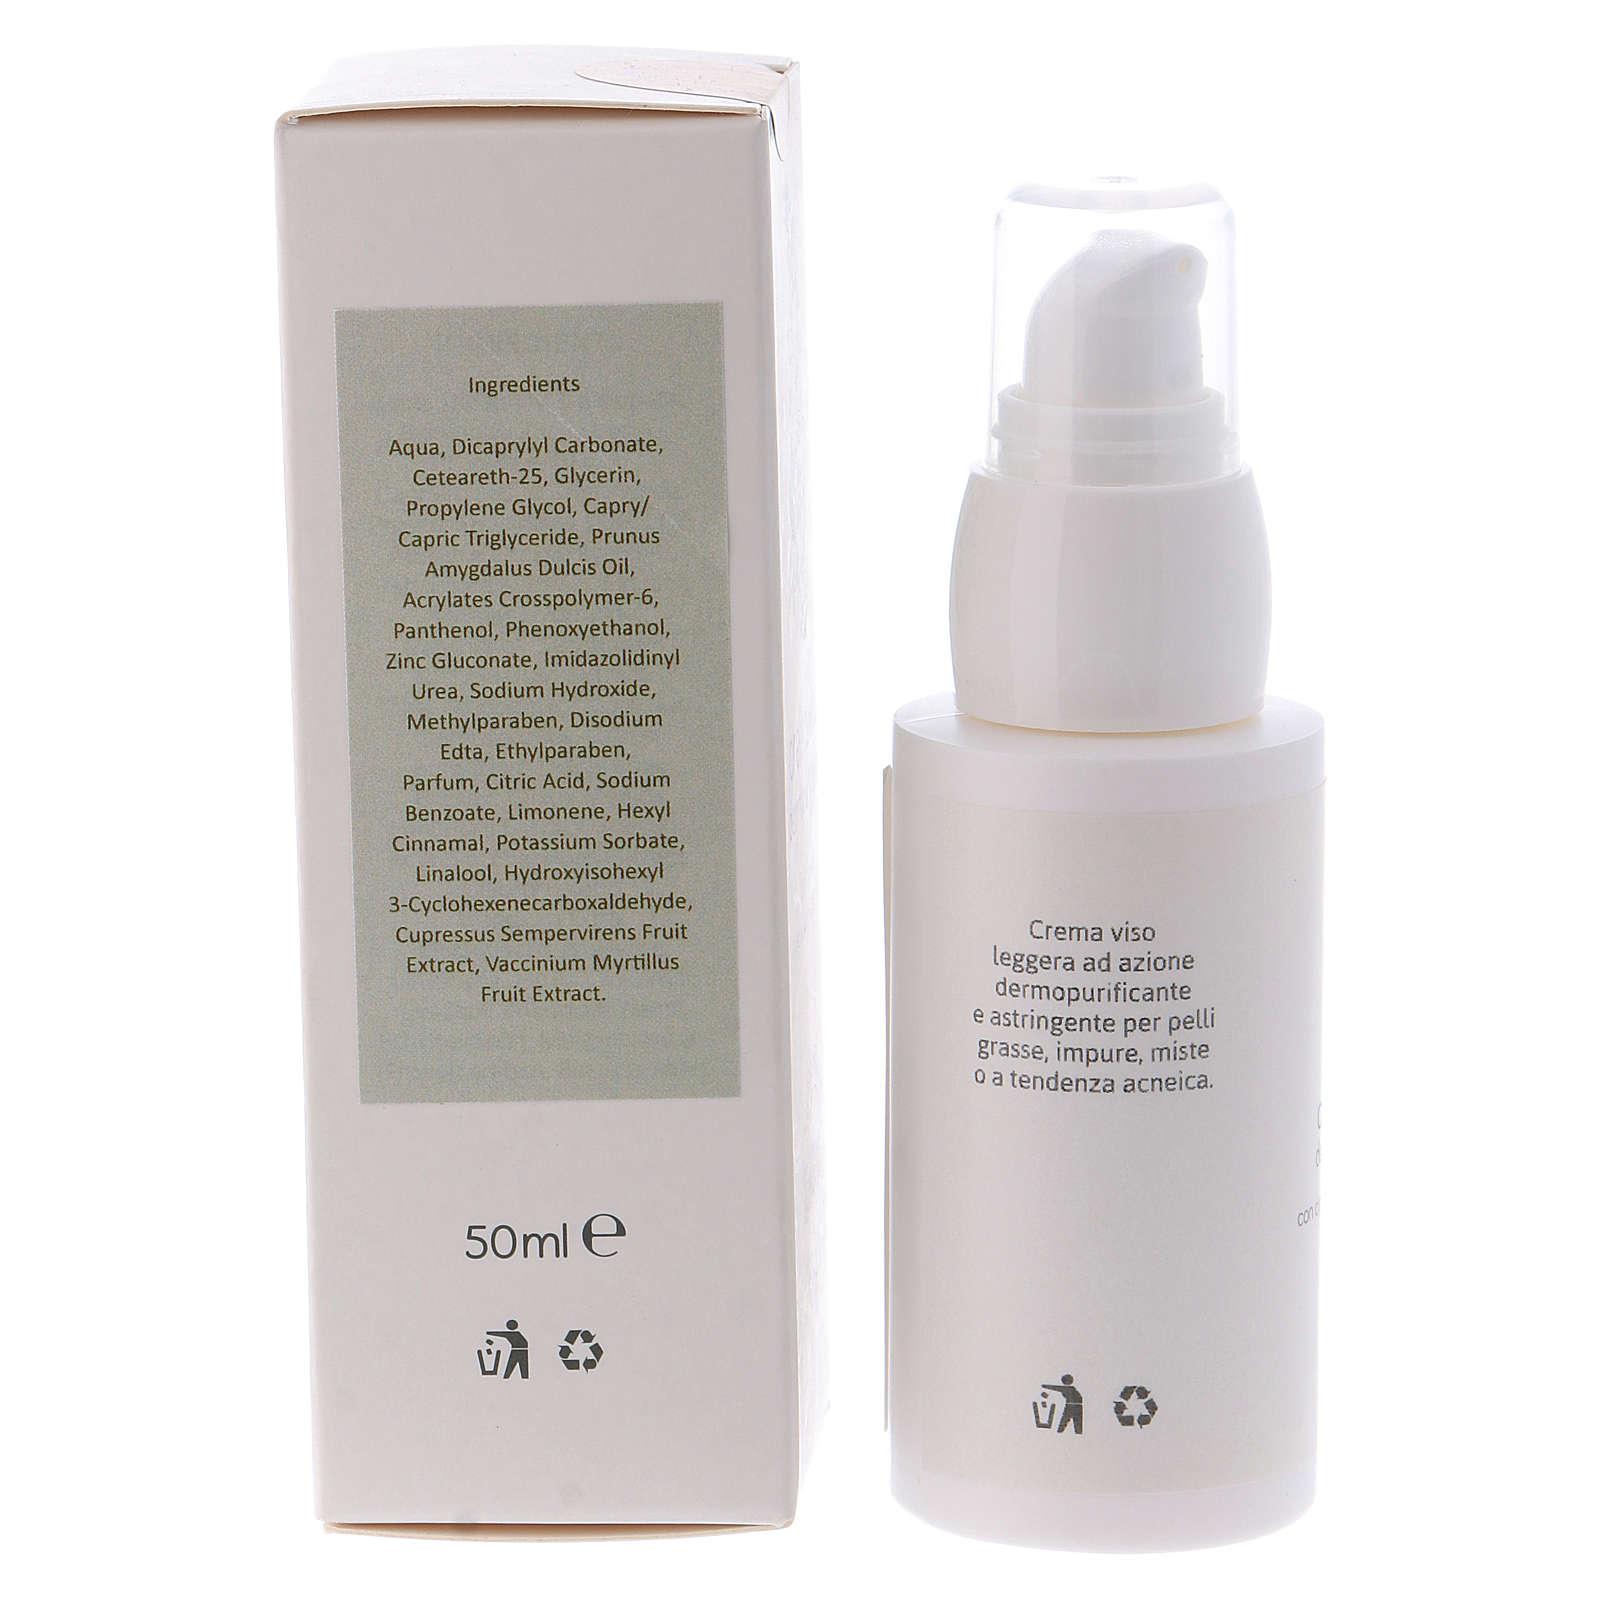 Crema viso dermopurificante 50 ml Valserena 4